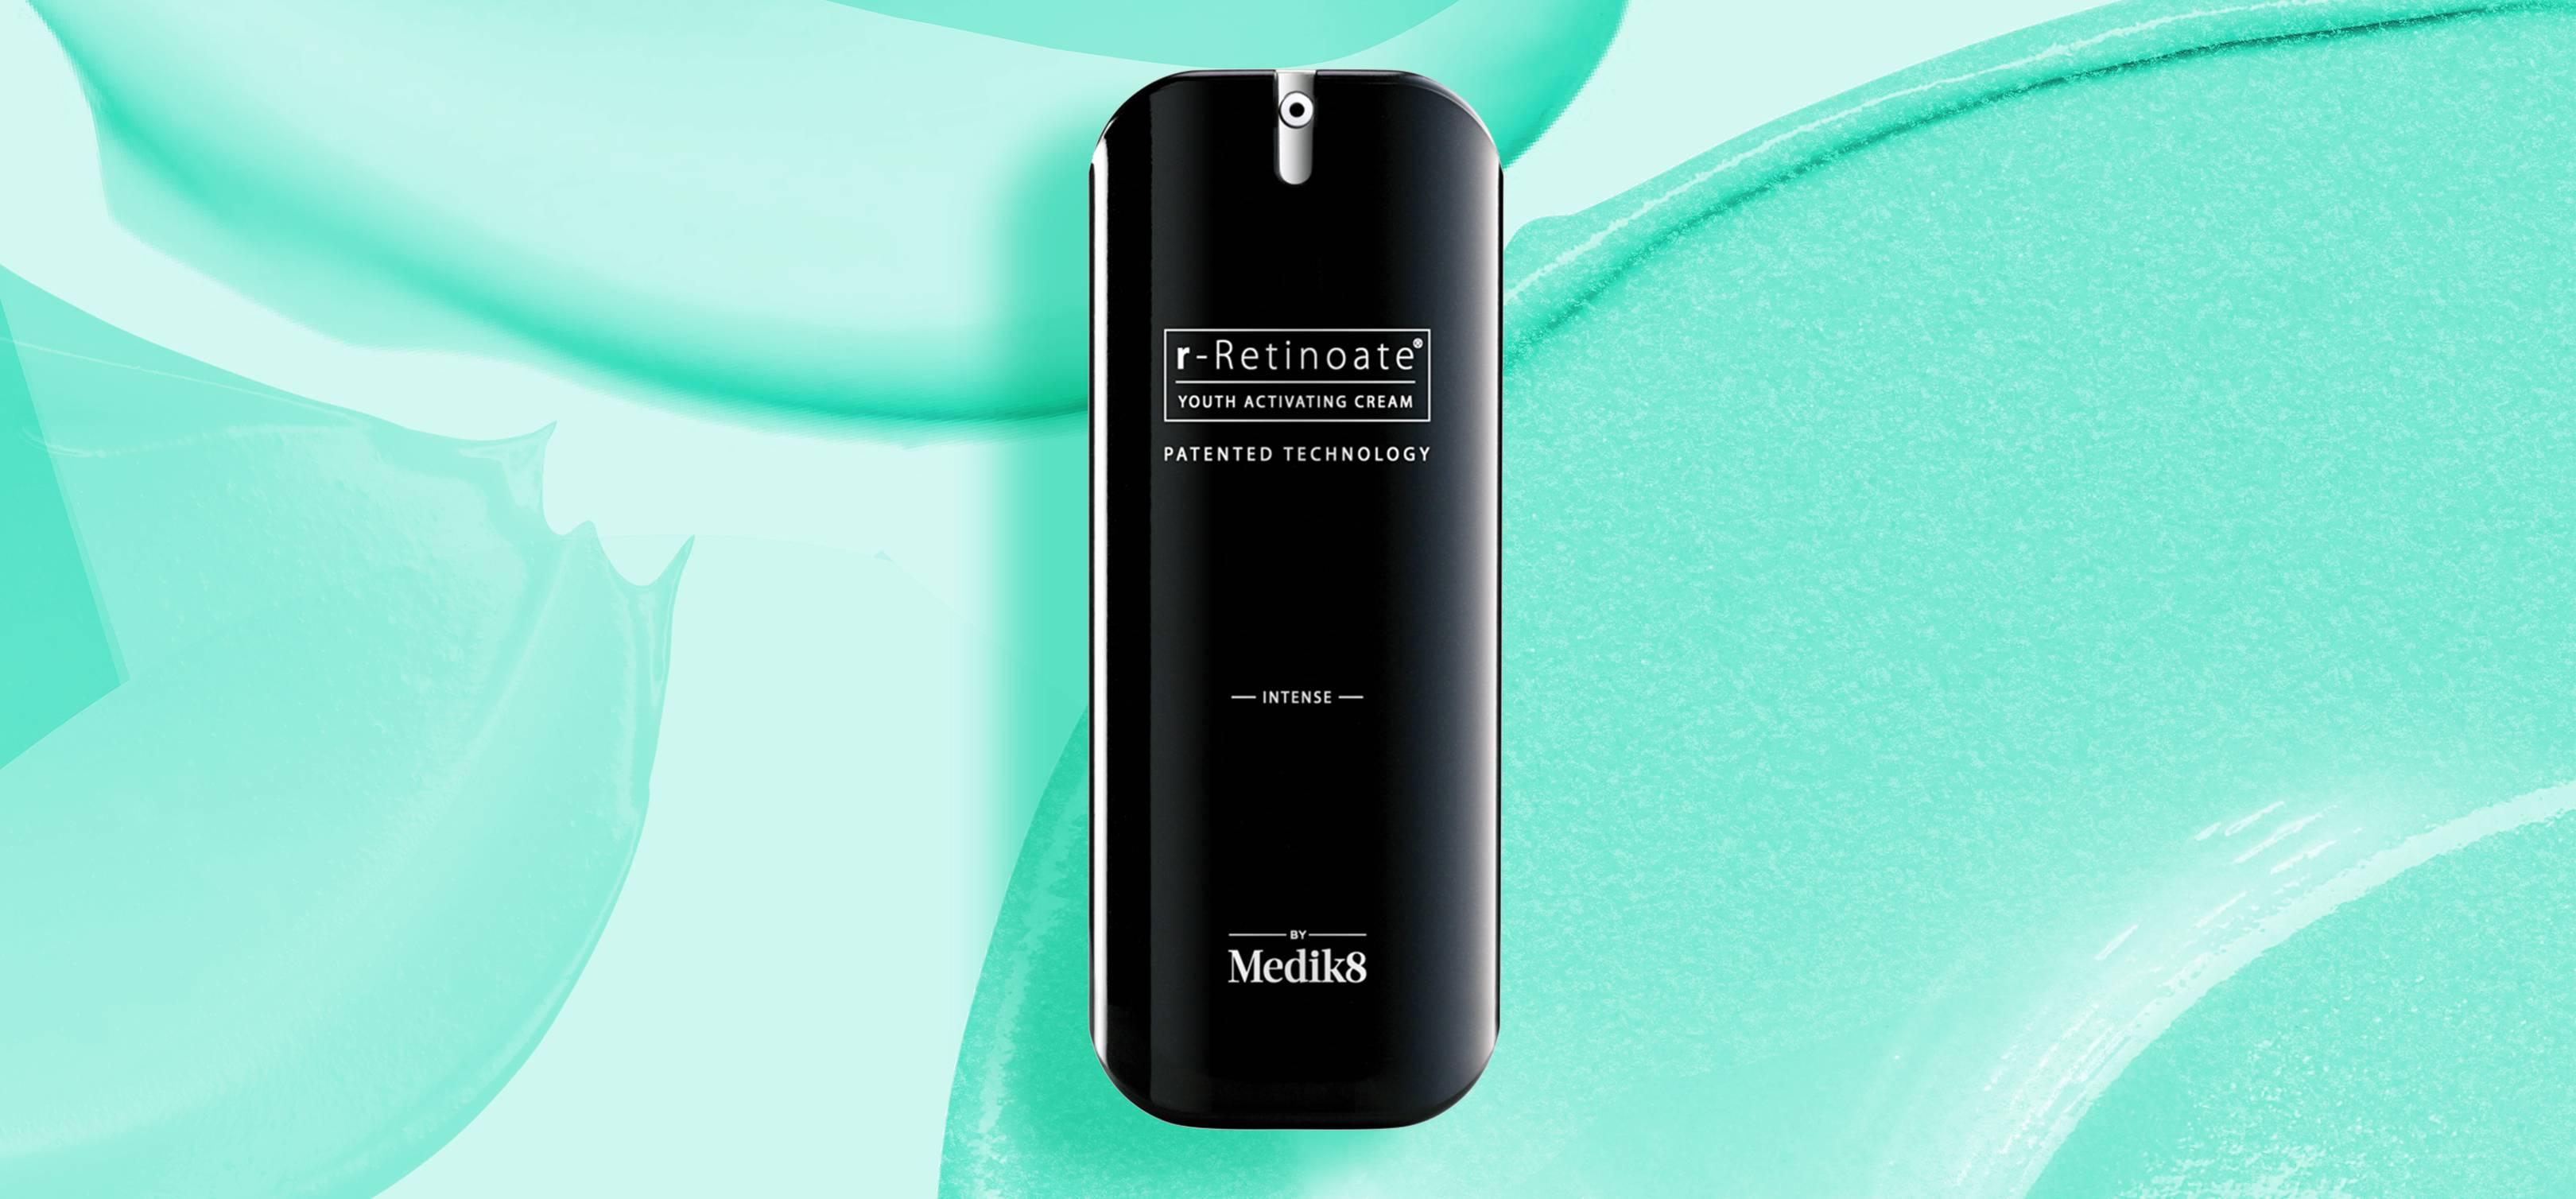 Medik8 r-Retinoate Intense Review   Glamour UK